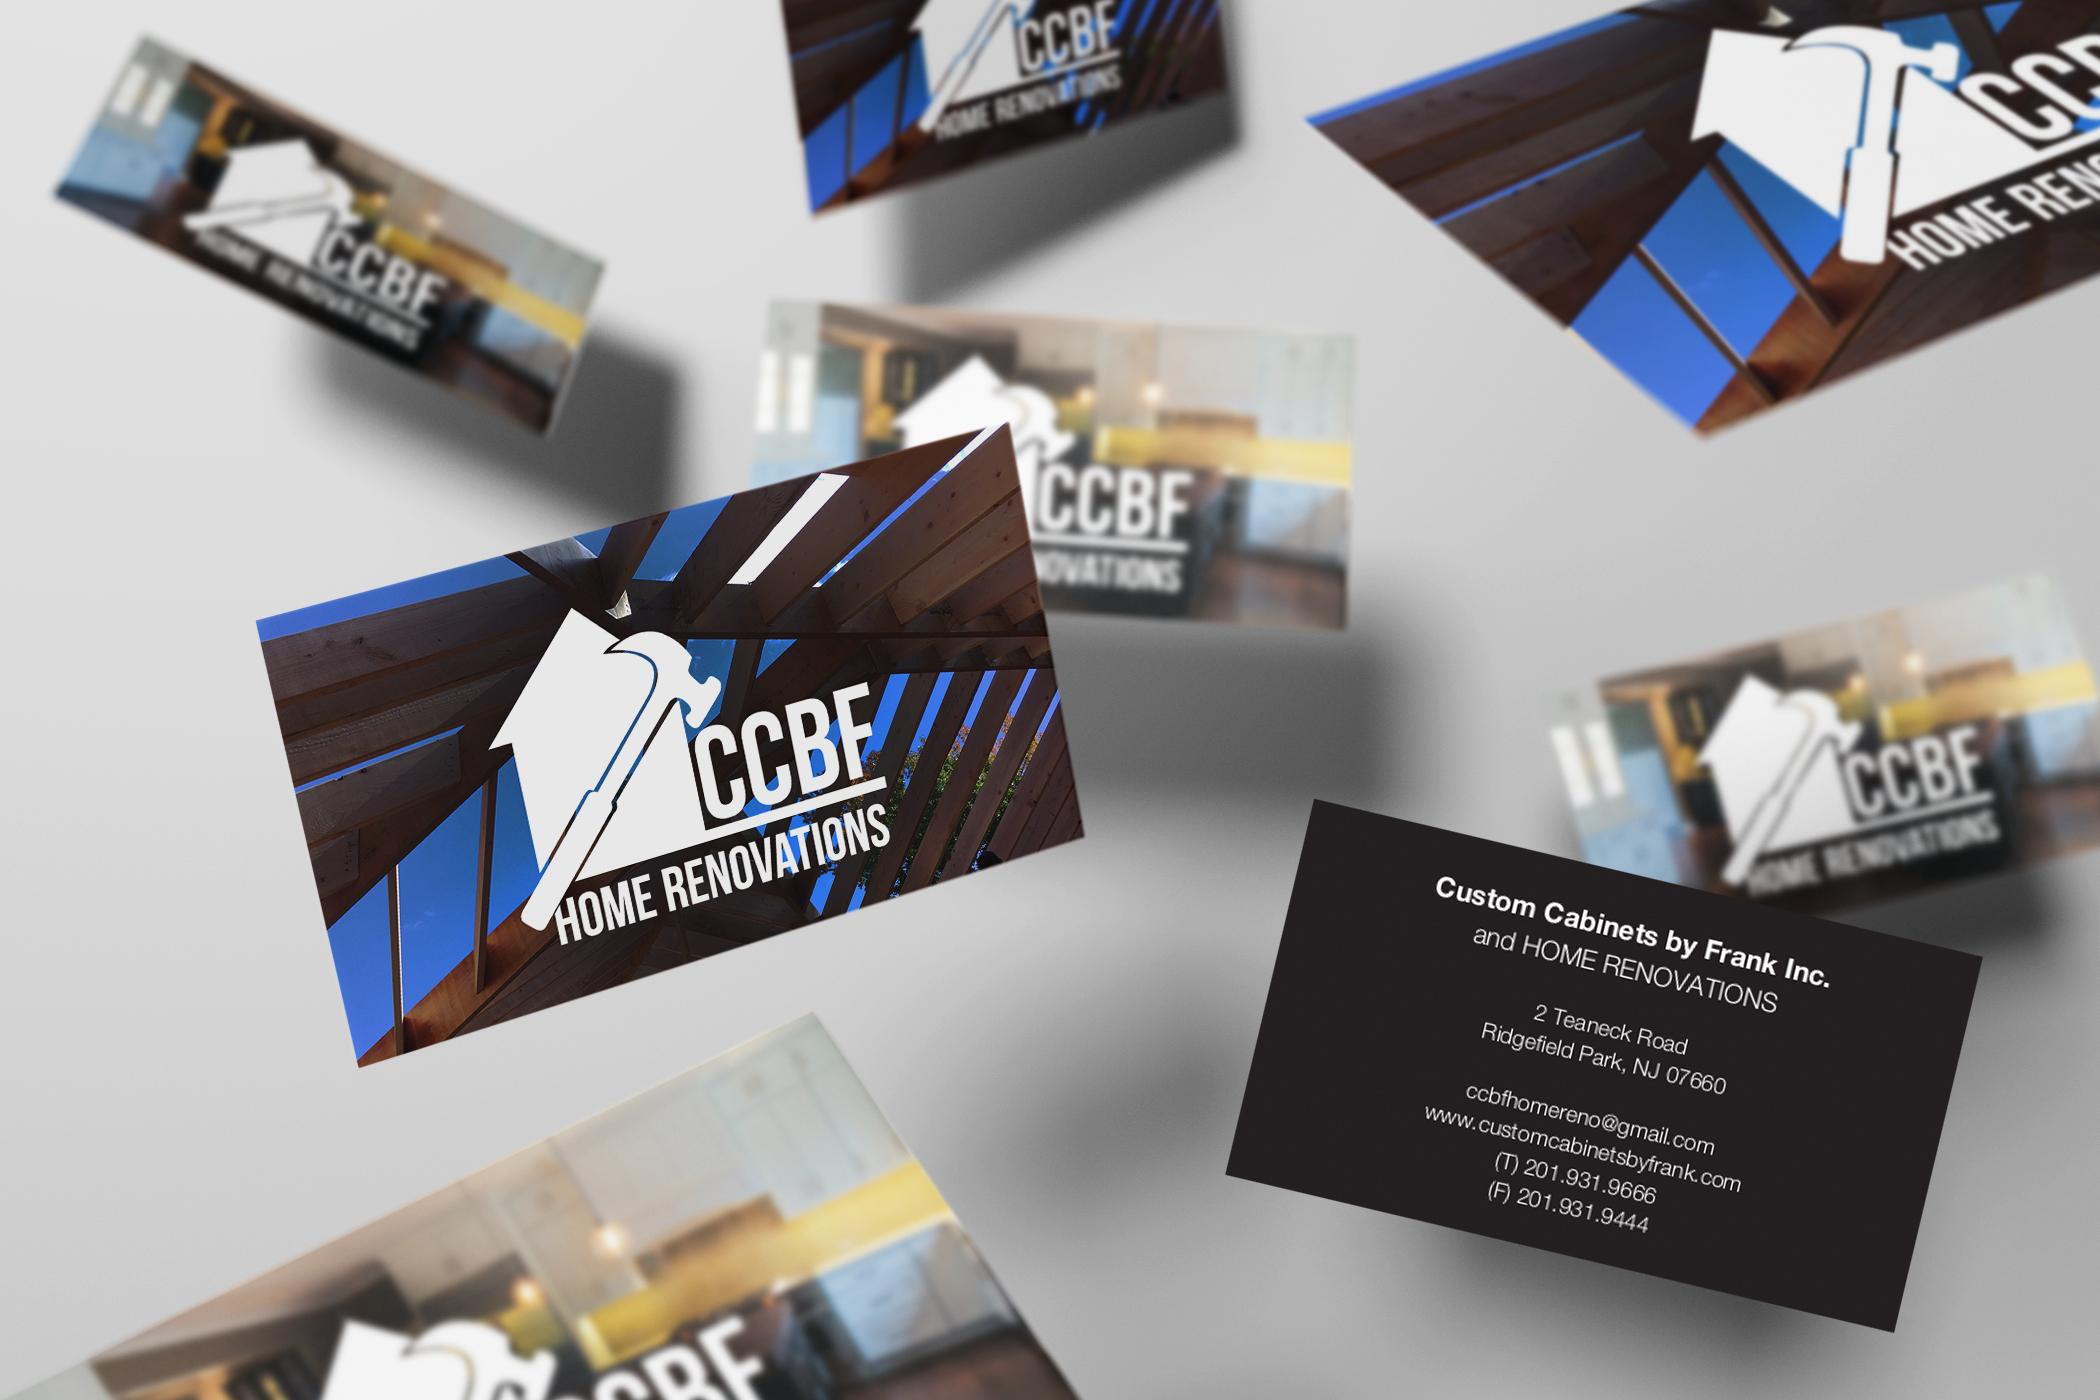 ccbf business cards.jpg